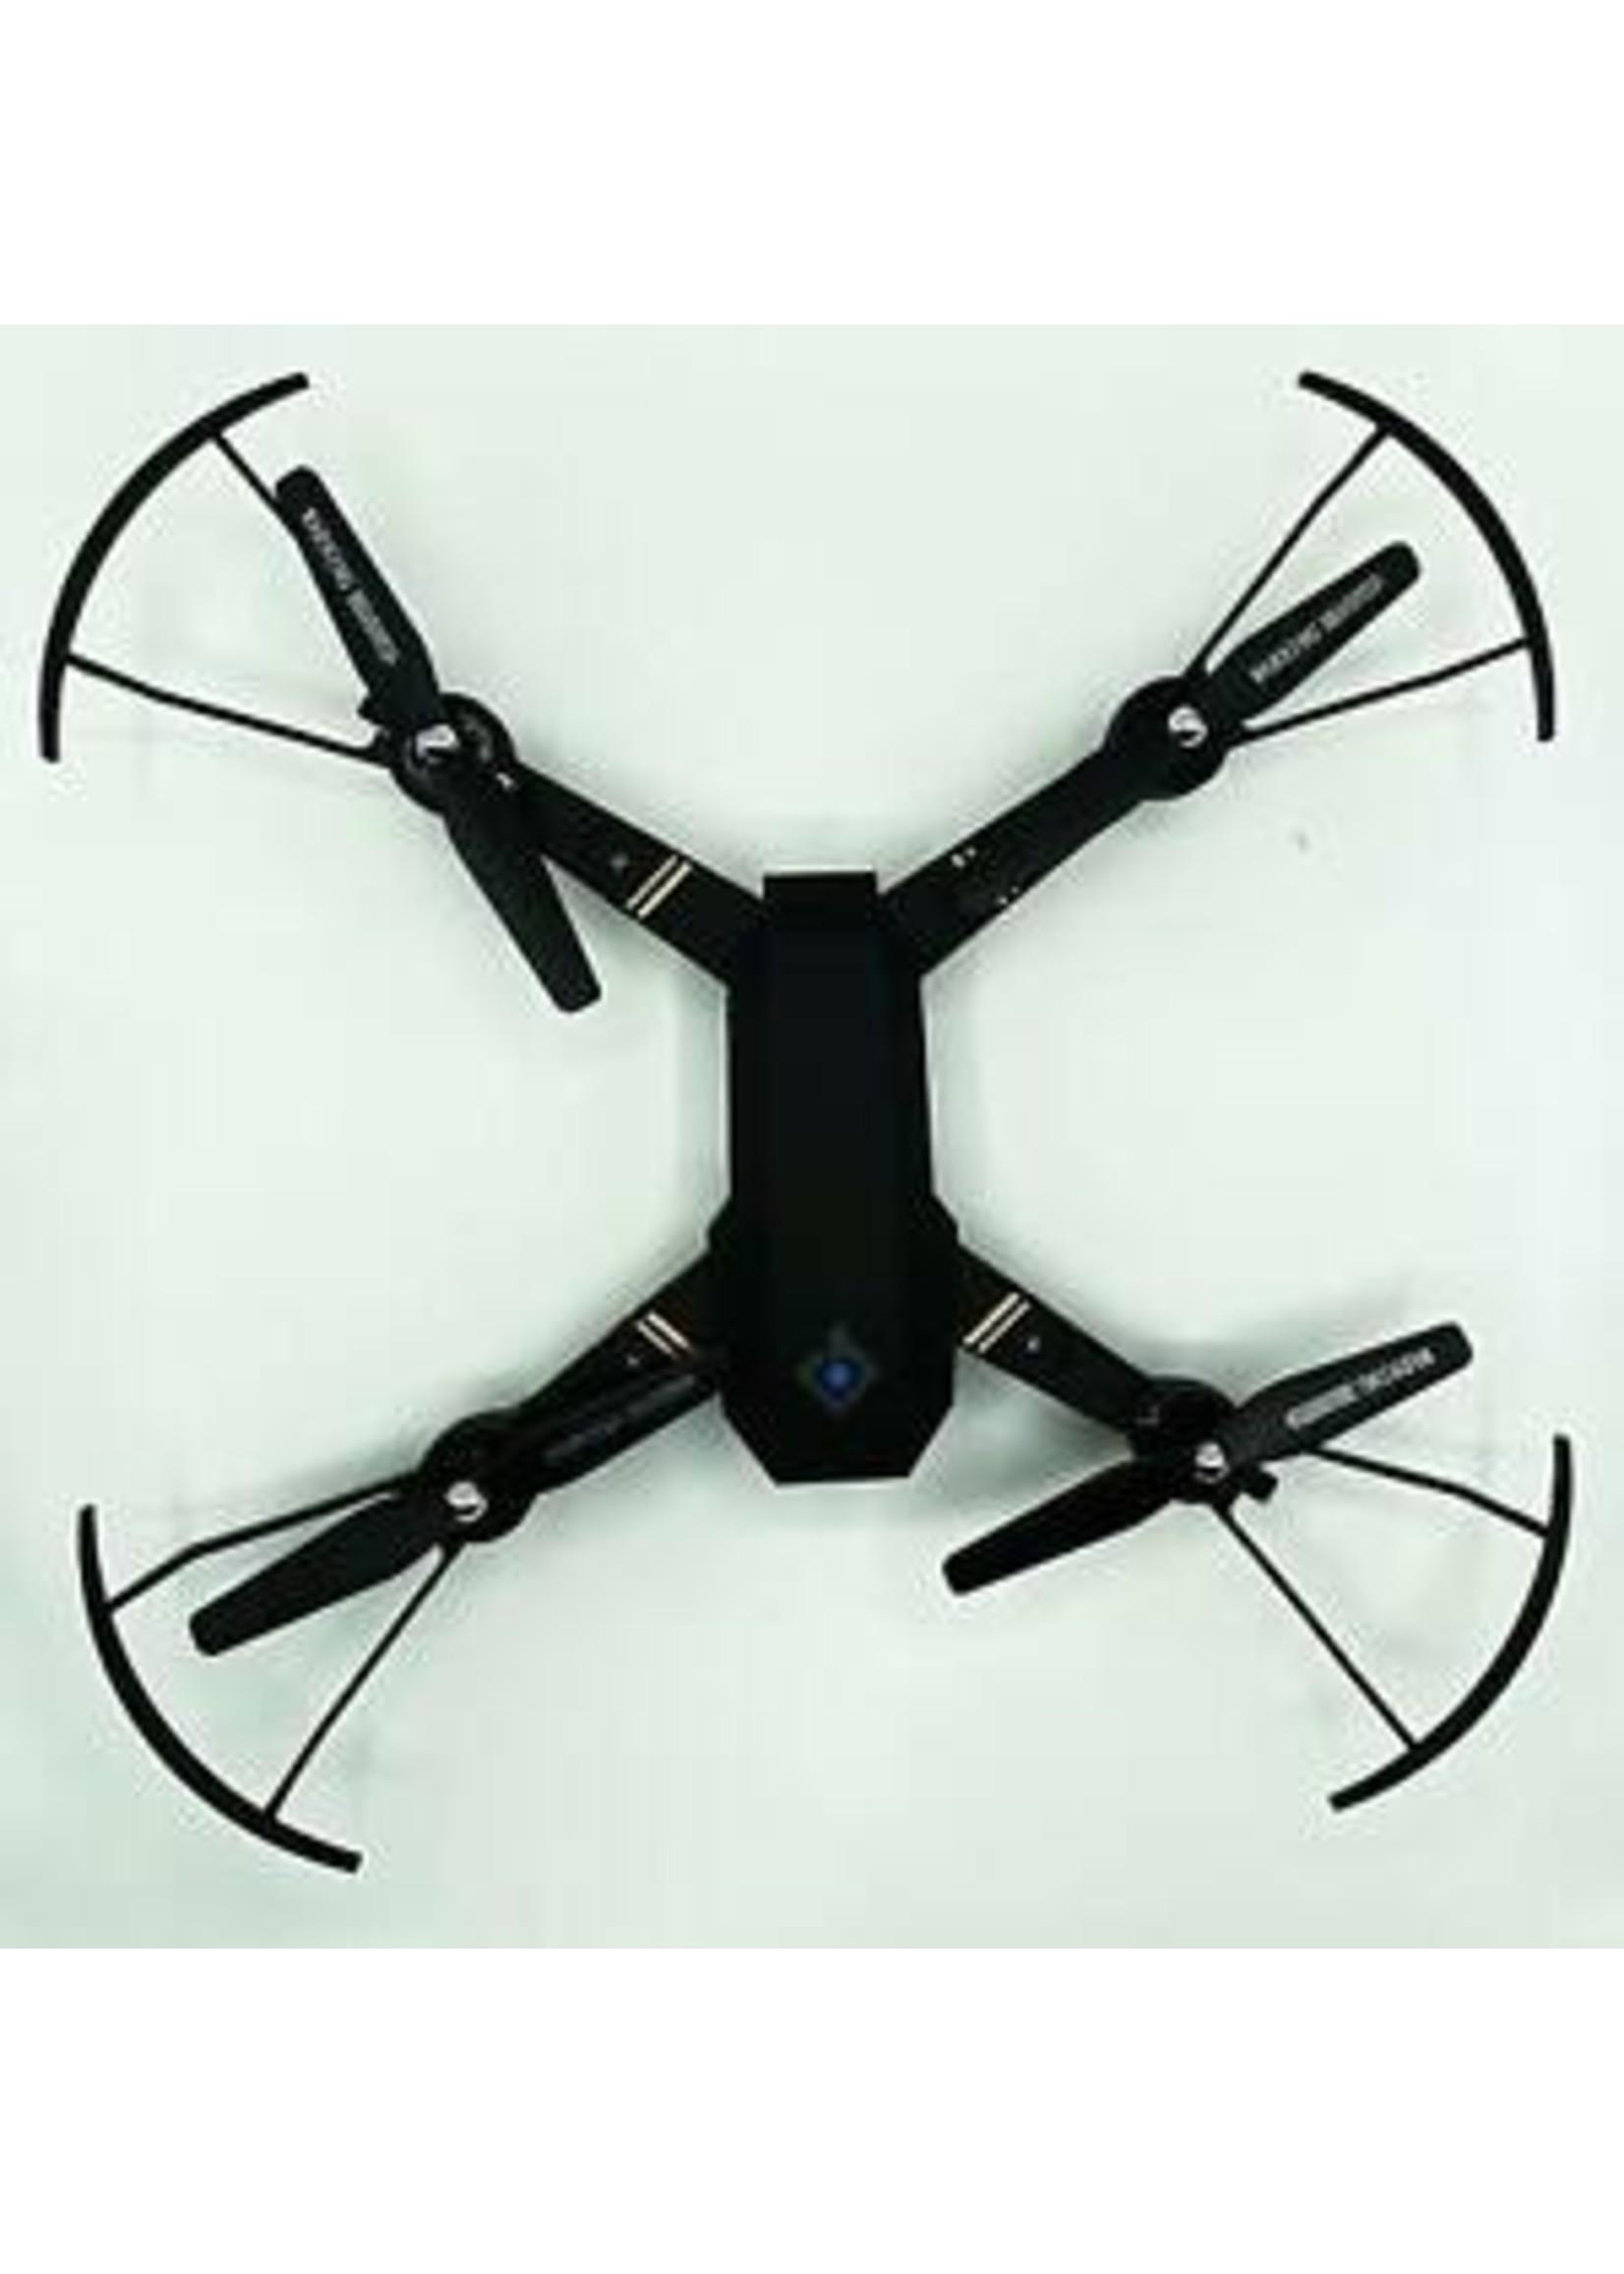 Iron Quad IQ-ZE-F-Pro Iron Quad Zealot F Pro Series Drone Set w/Camera